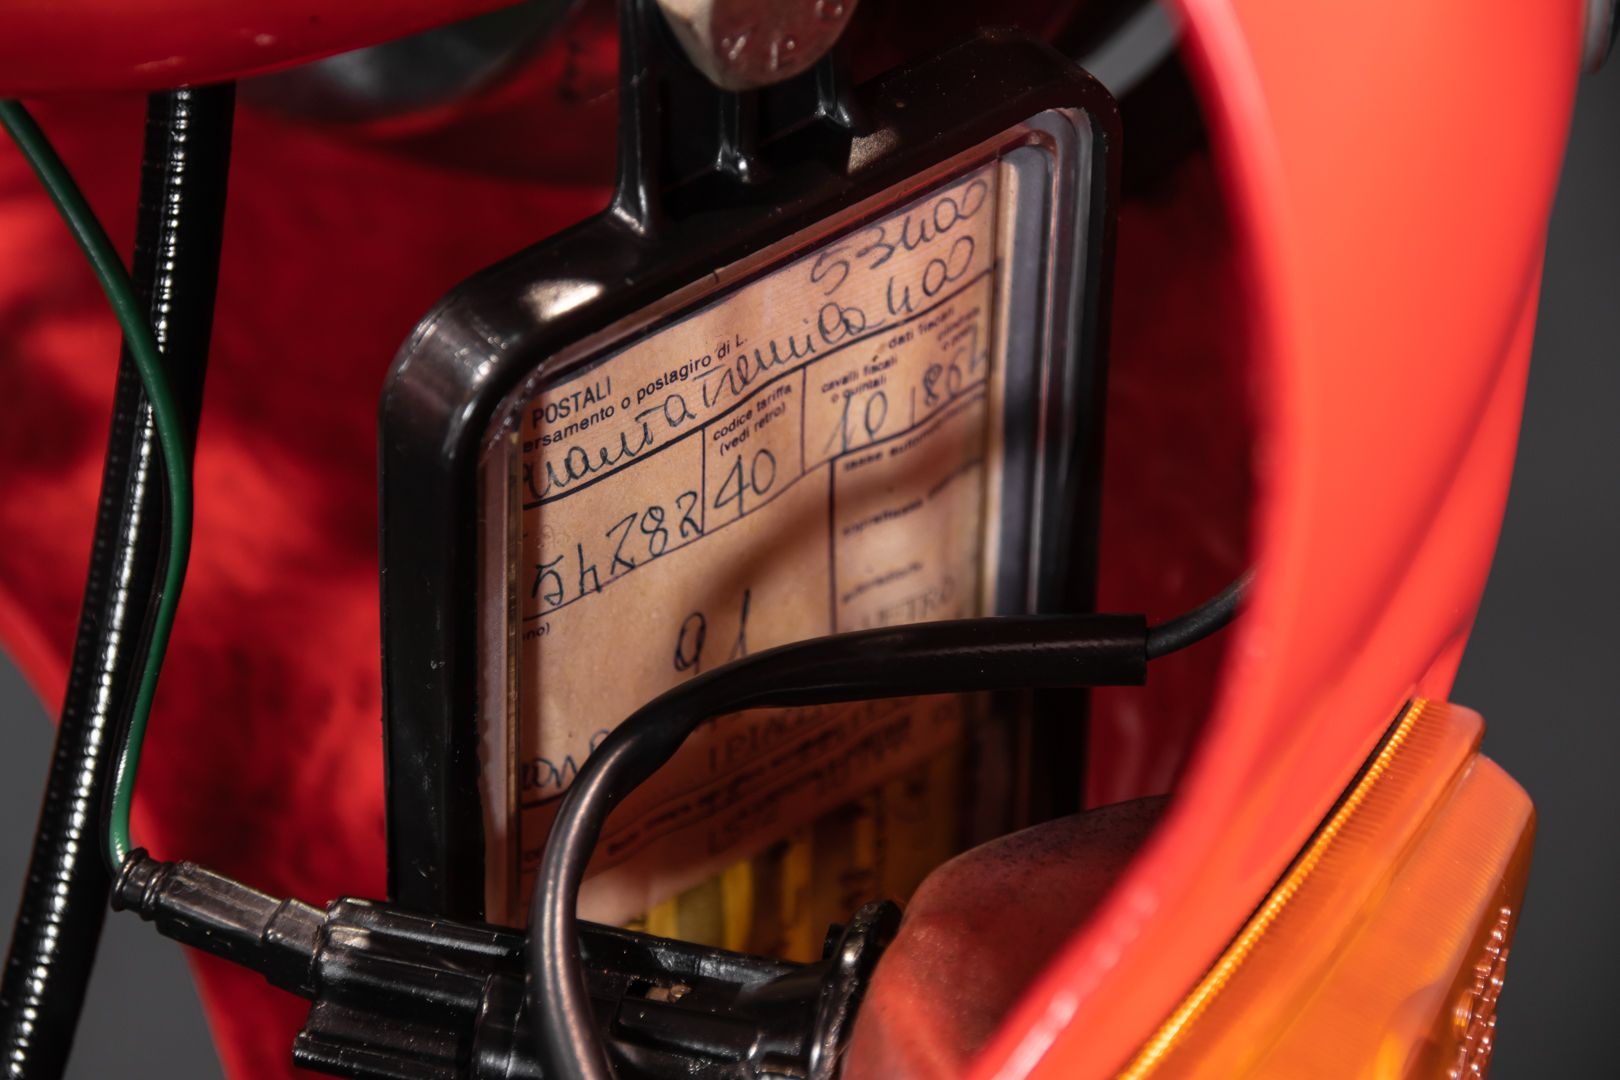 1983 Ducati 900 Mike Hailwood Replica 71437